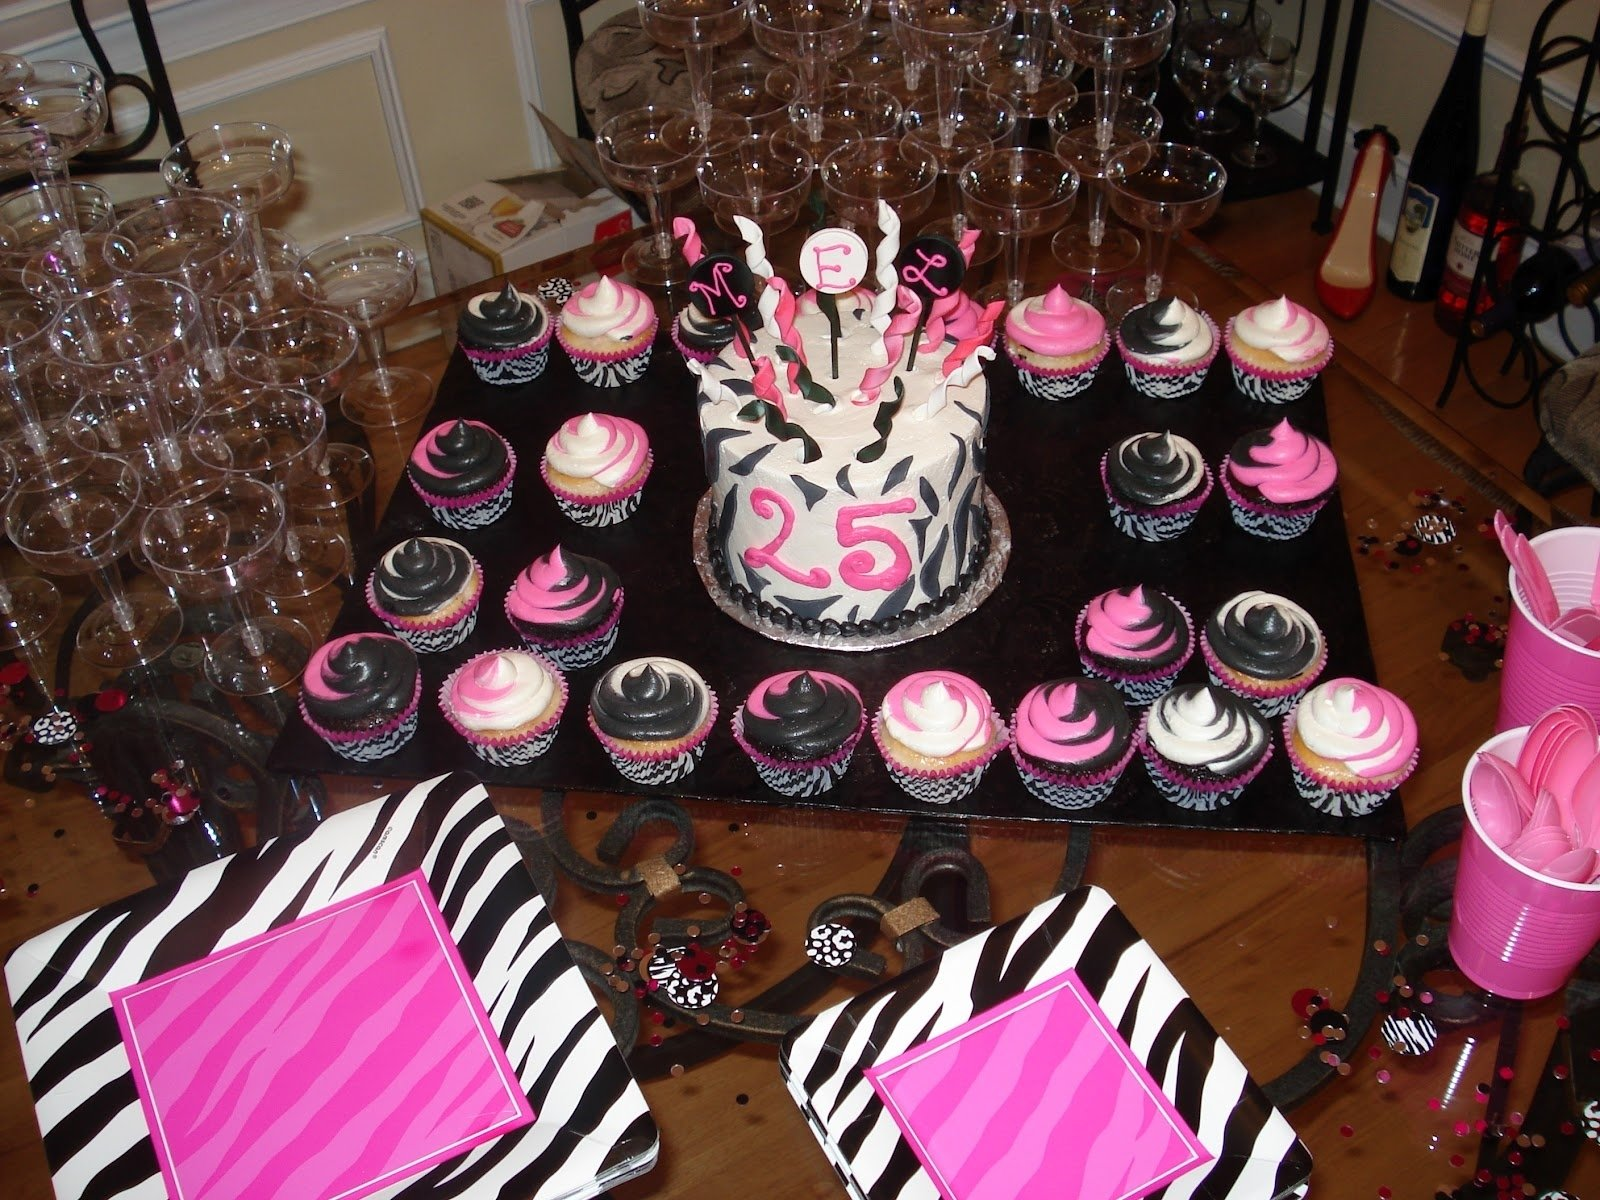 10 Stylish 25Th Birthday Party Ideas For Him 25th birthday party ideas for a man criolla brithday wedding 2020